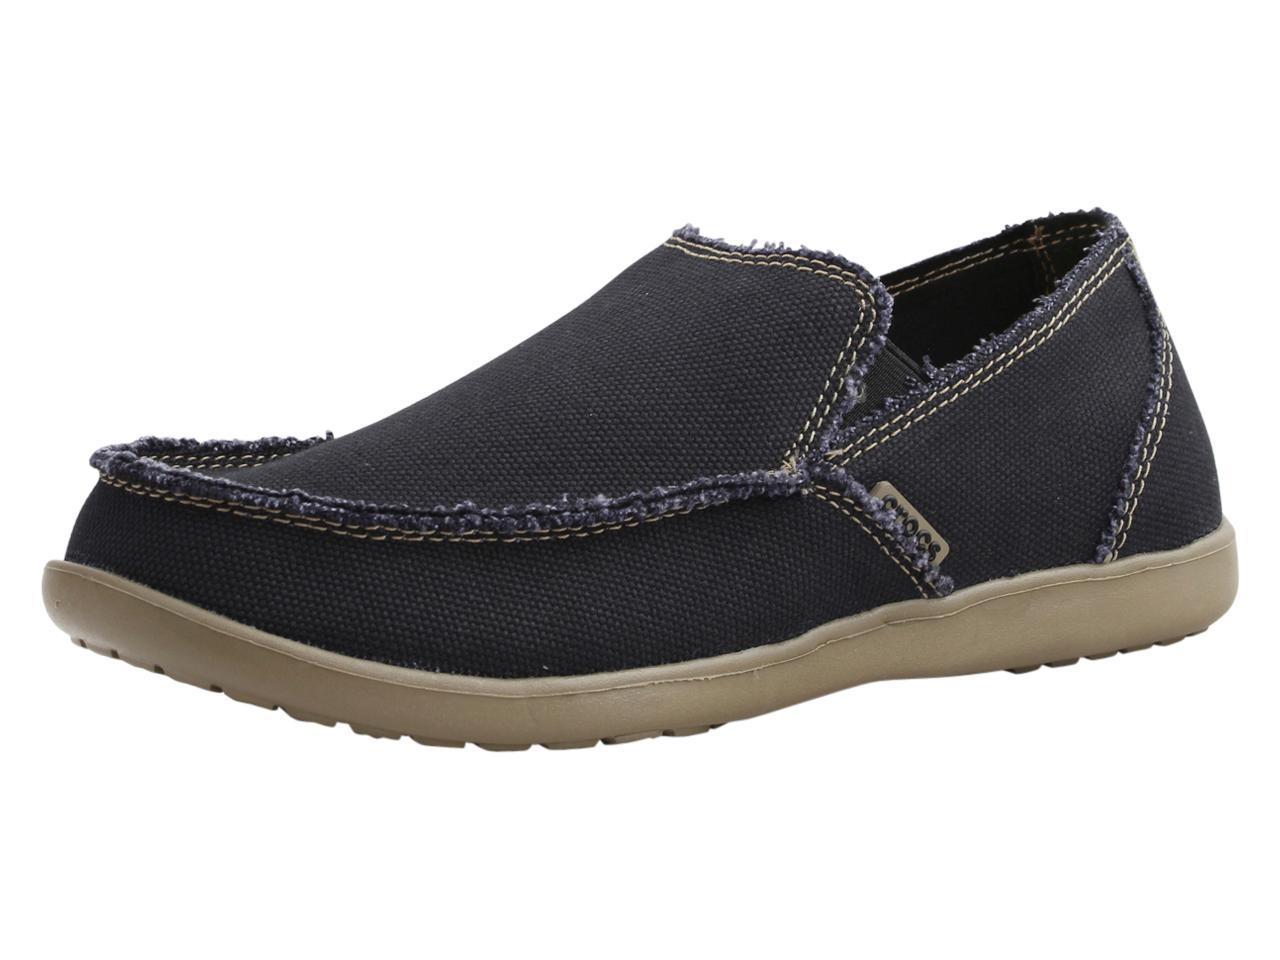 Image of Crocs Men's Santa Cruz Loafers Shoes - Black/Khaki - 13 D(M) US